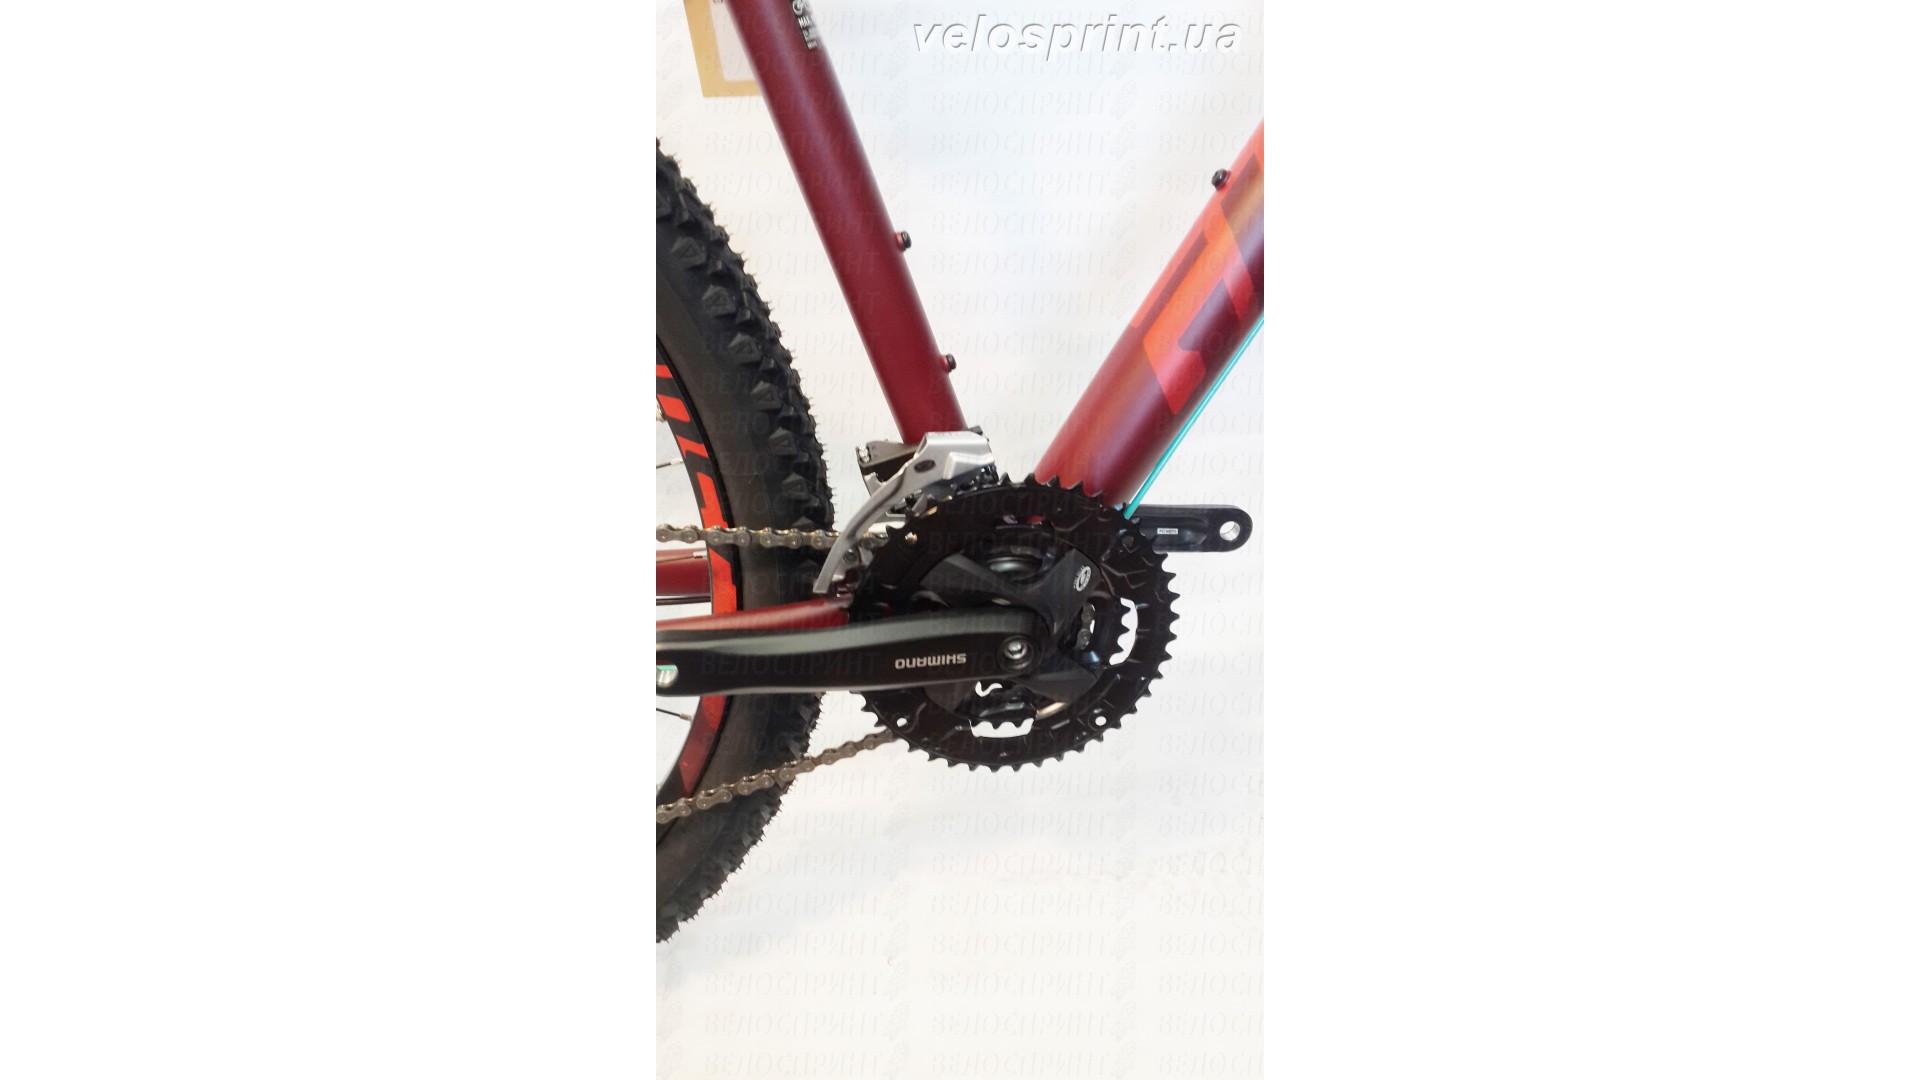 Велосипед GHOST Kato 3 AL 29 marsalared/cranberryred/jadeblue шатуны год 2017